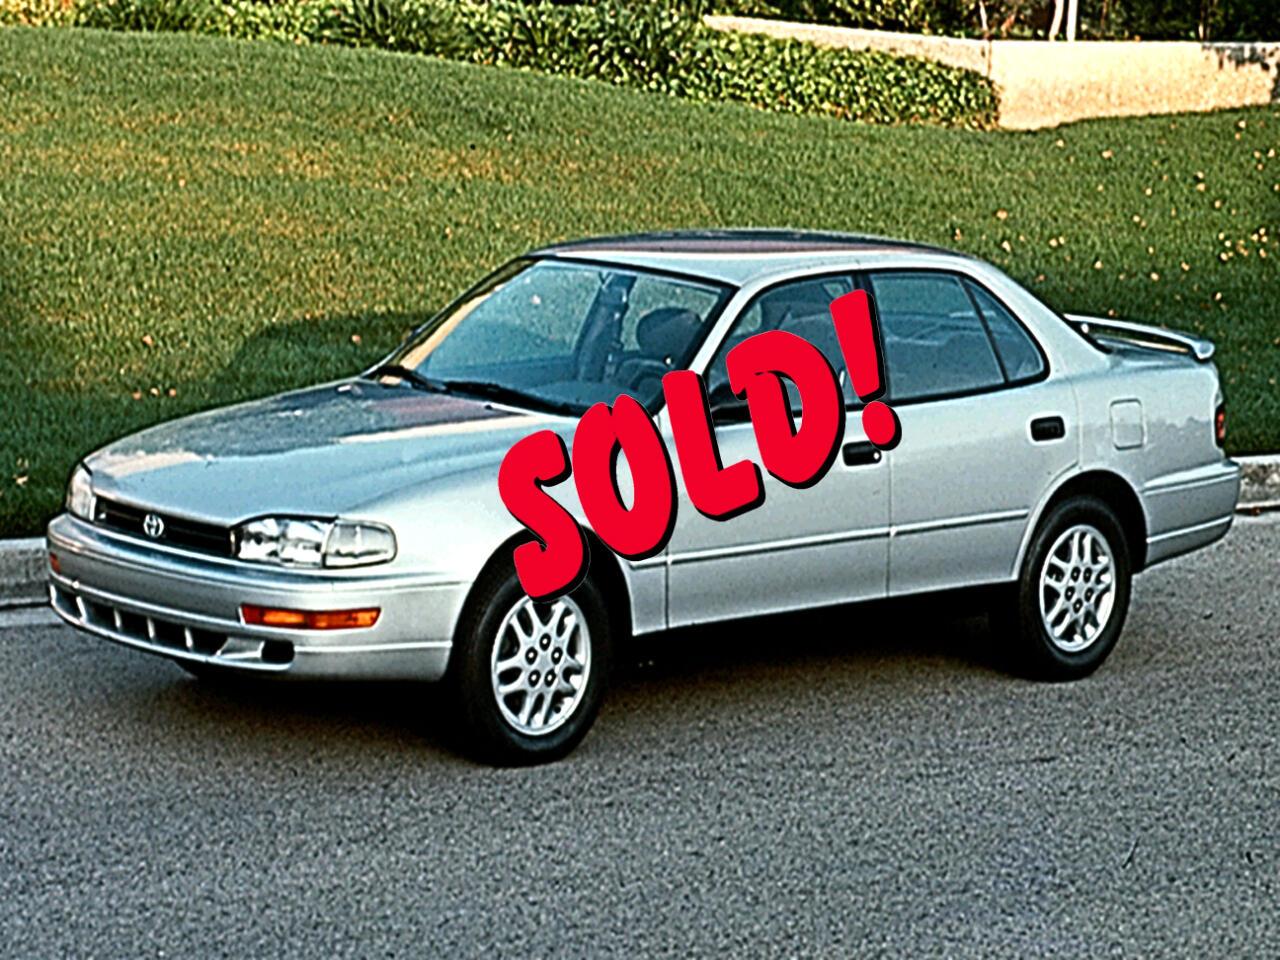 Toyota Camry 4dr Sdn I4 Auto LE (Natl) 1995